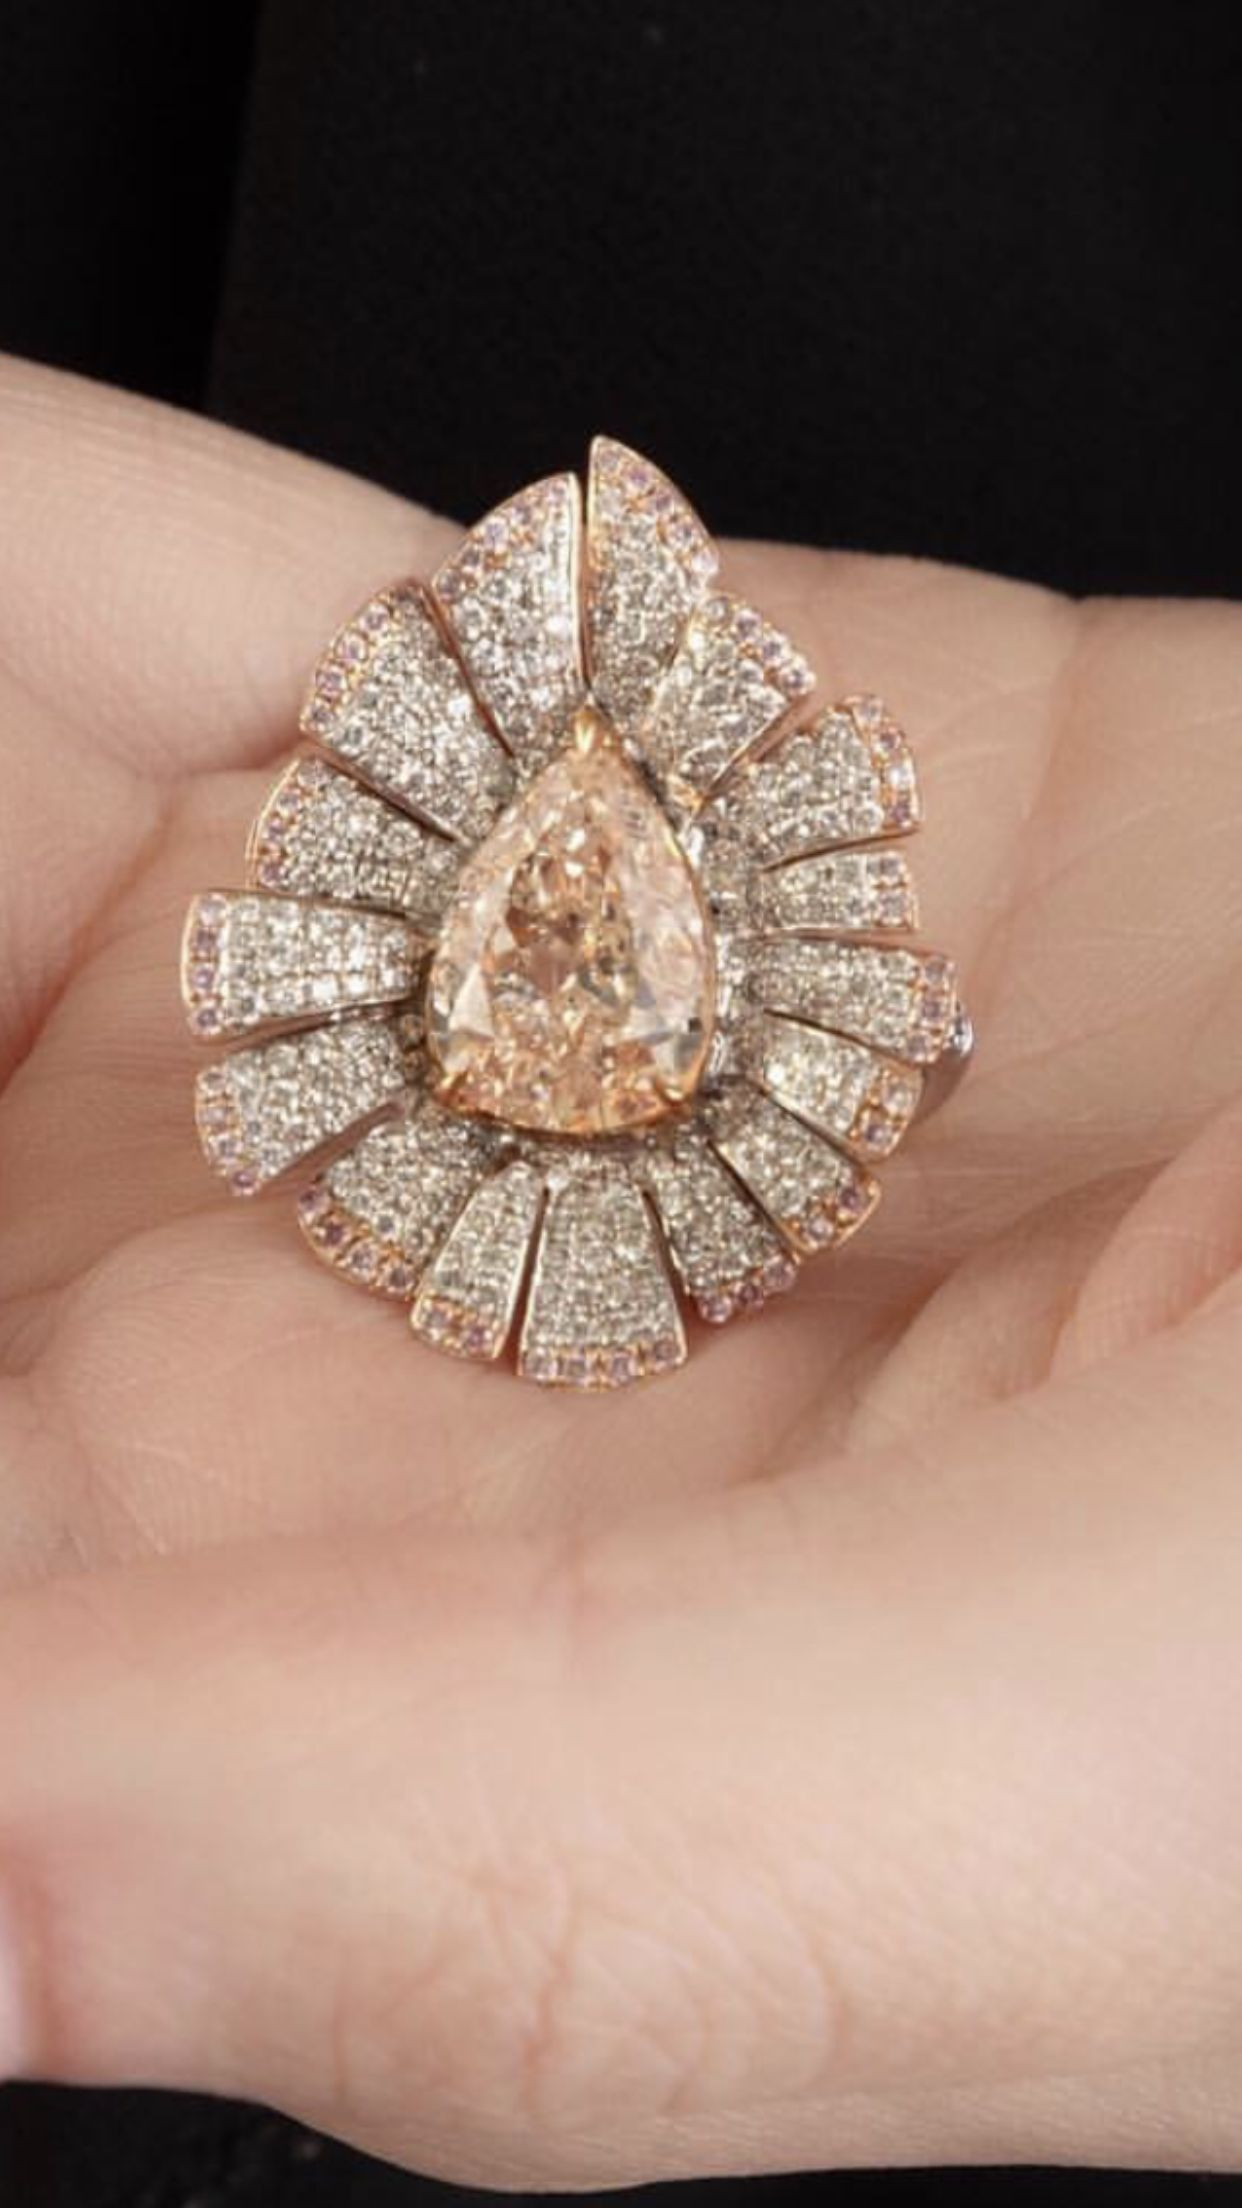 3ffd67e99 Jewelry Case, Jewelry Rings, Fine Jewelry, Ring Earrings, Ring Bracelet,  Colored